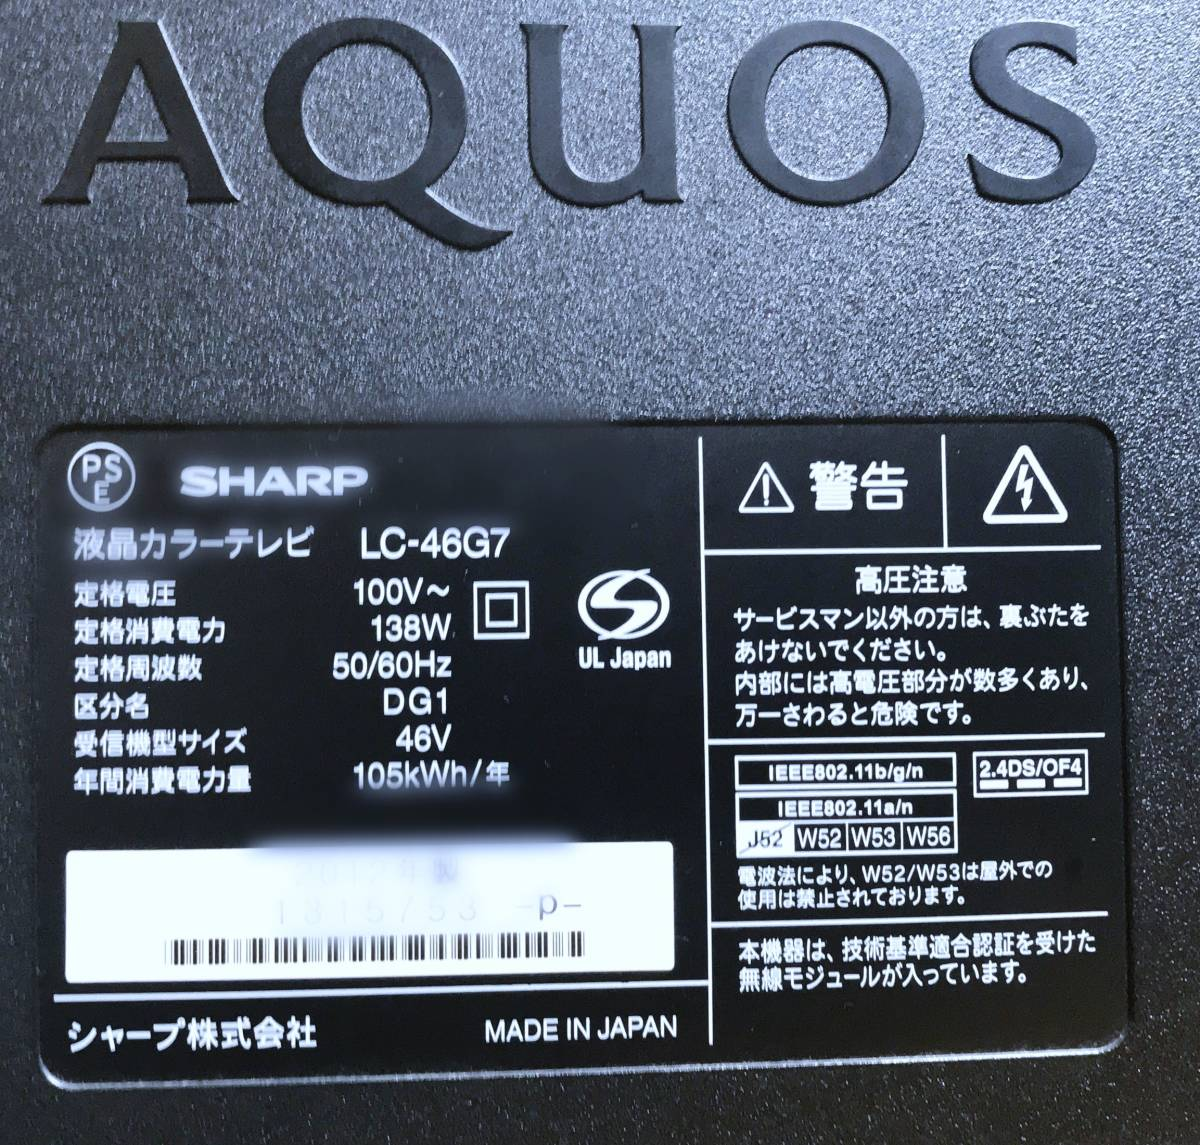 【LC-46G7☆画面分割/3D☆超美品】SHARP☆LED 3D AQUOS☆デジタル フルハイビジョン液晶T.V☆22型☆外付けHDD☆完動品!_画像10